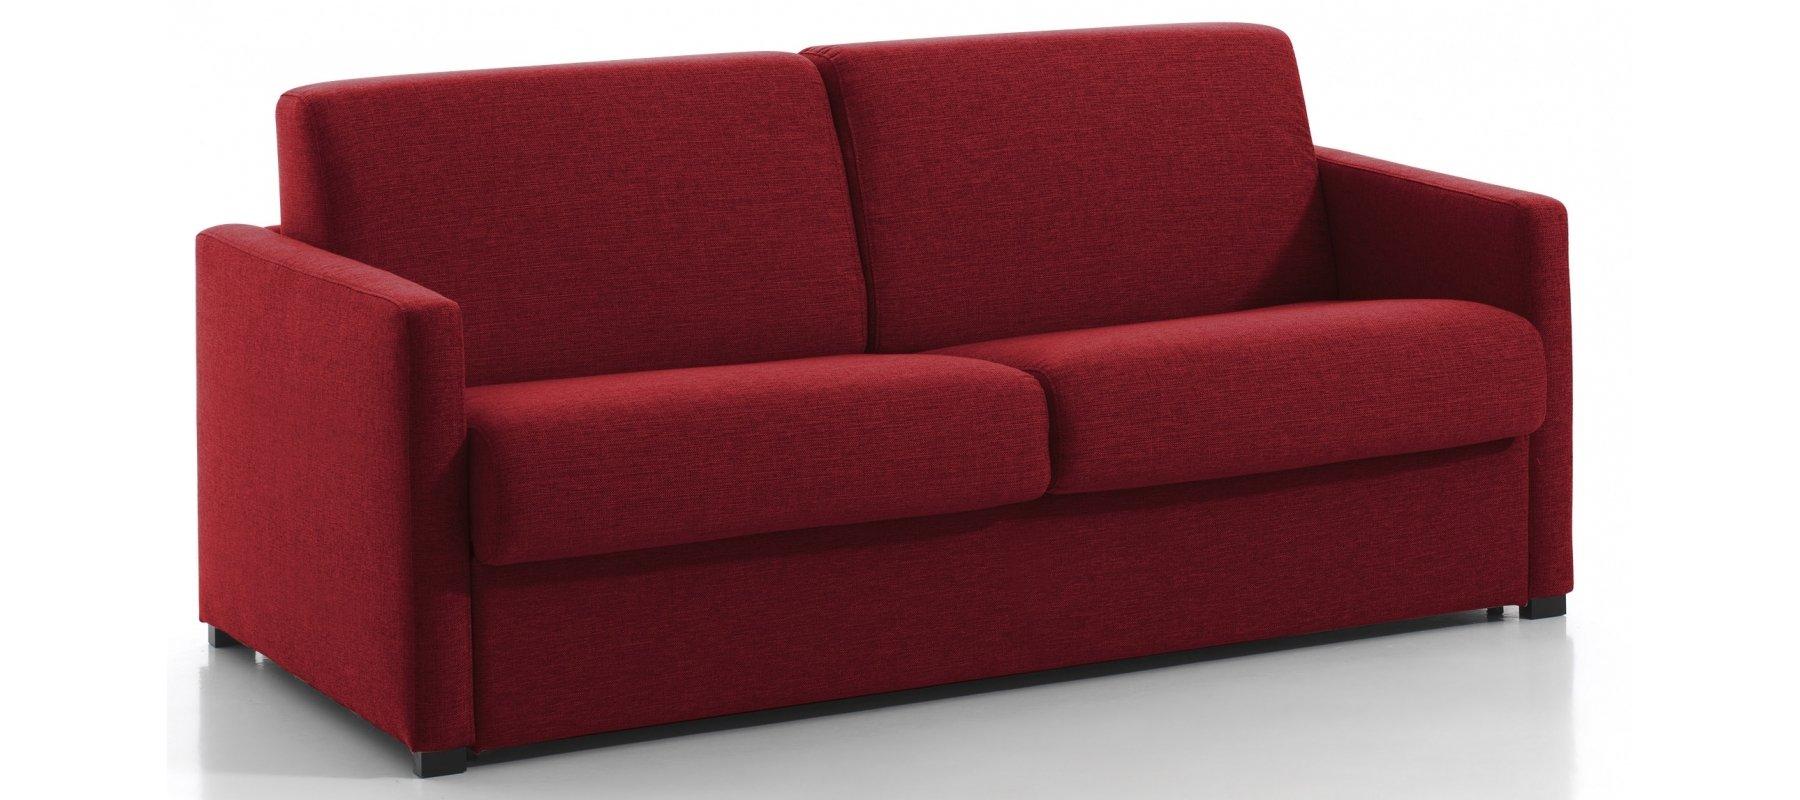 canap convertible 4 places rapido metz couchage quotidien 160 cm. Black Bedroom Furniture Sets. Home Design Ideas